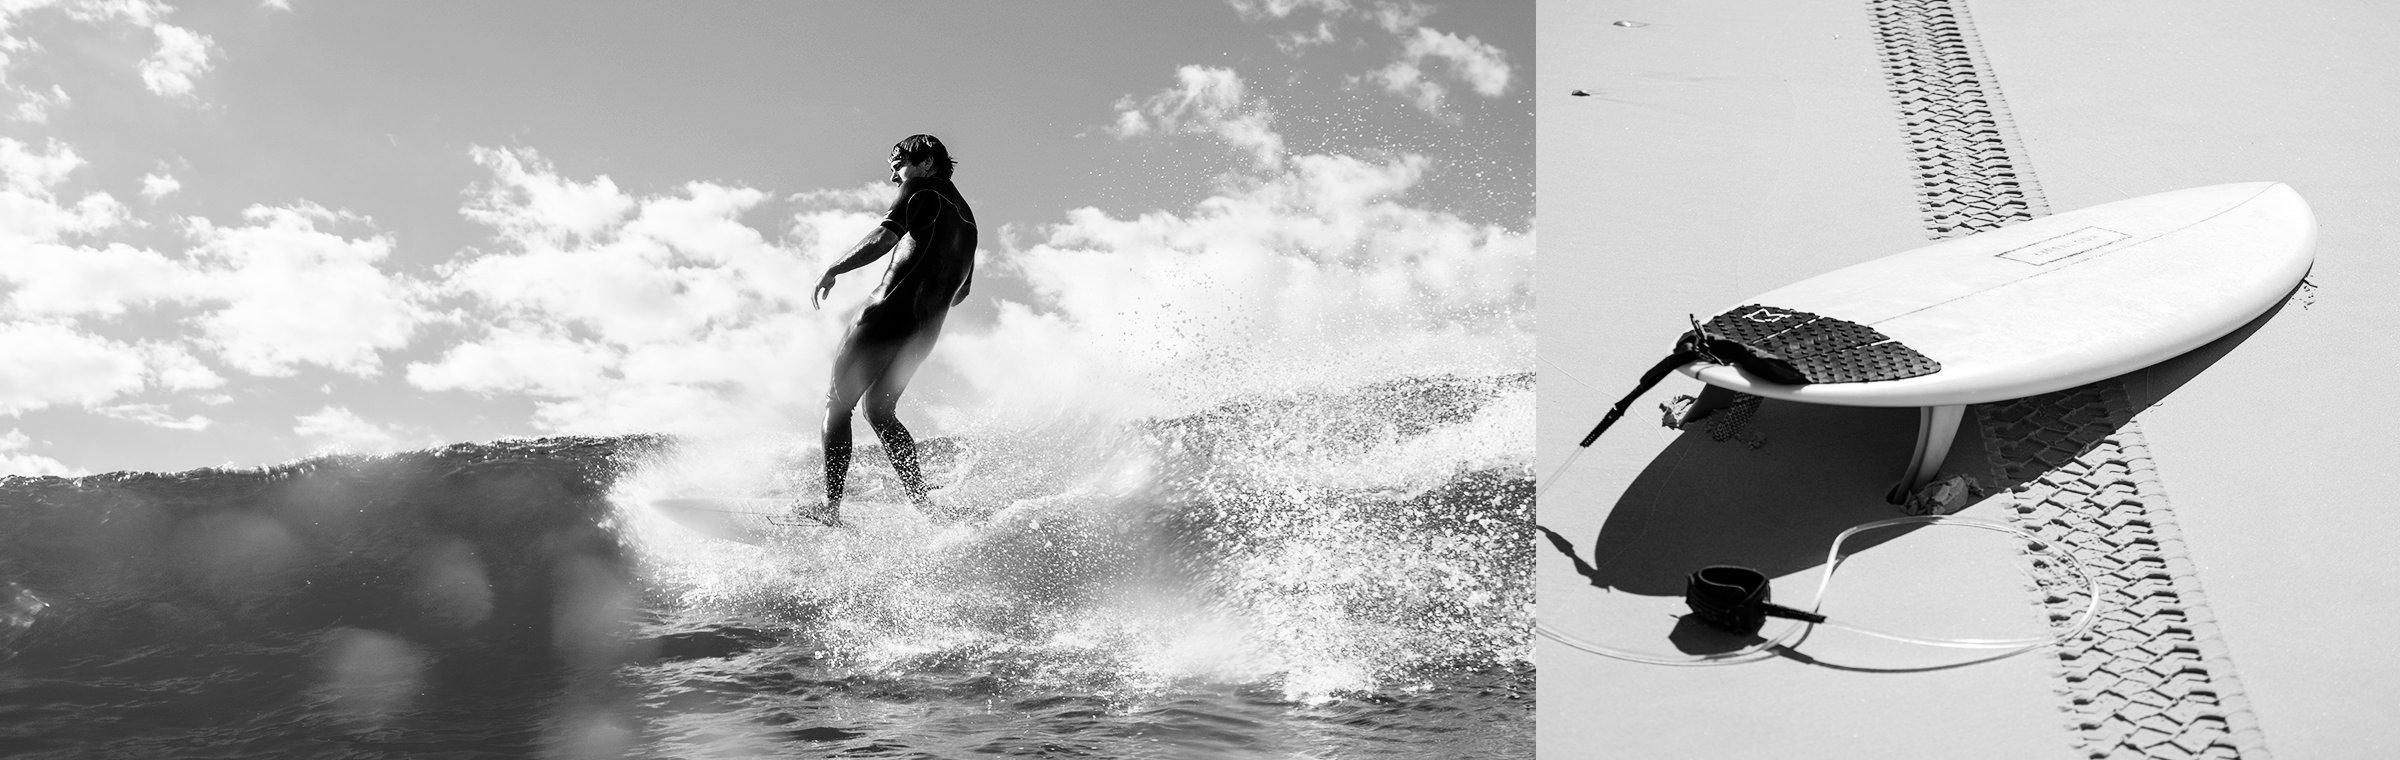 Modom surfboards